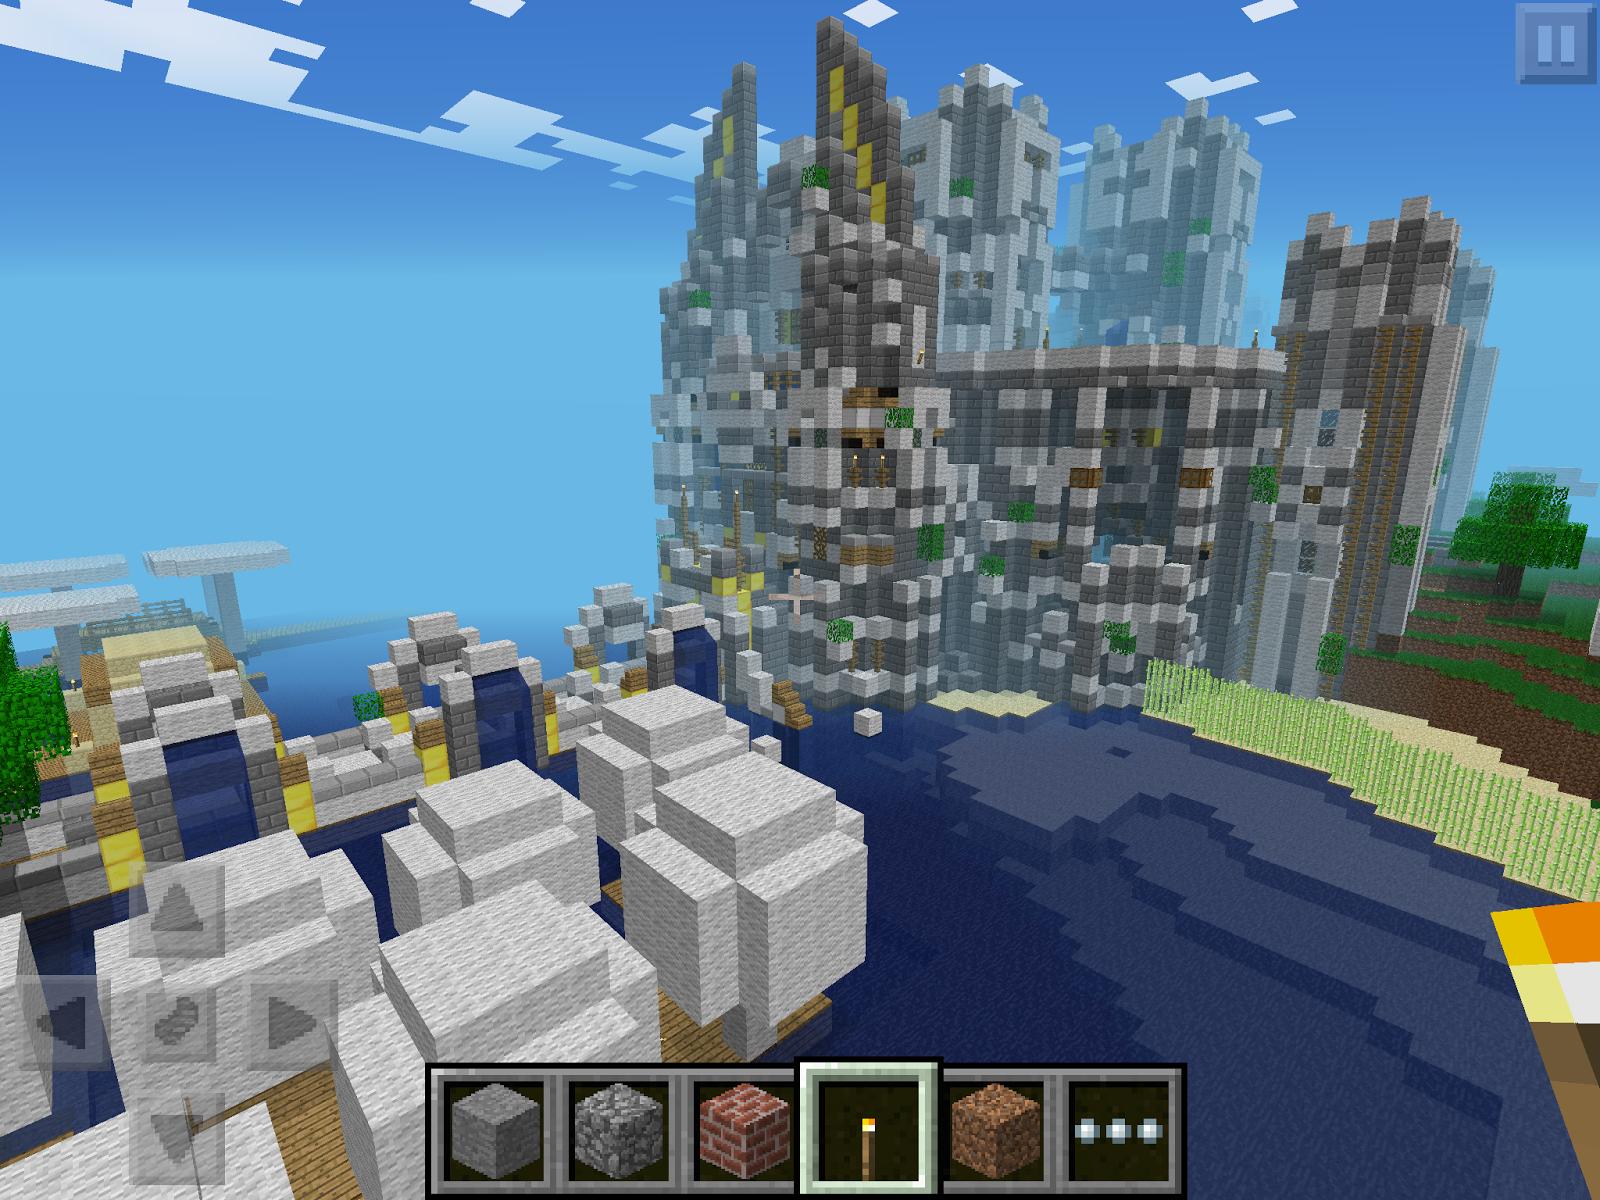 Minecraft PE Worlds: Syndicates Project